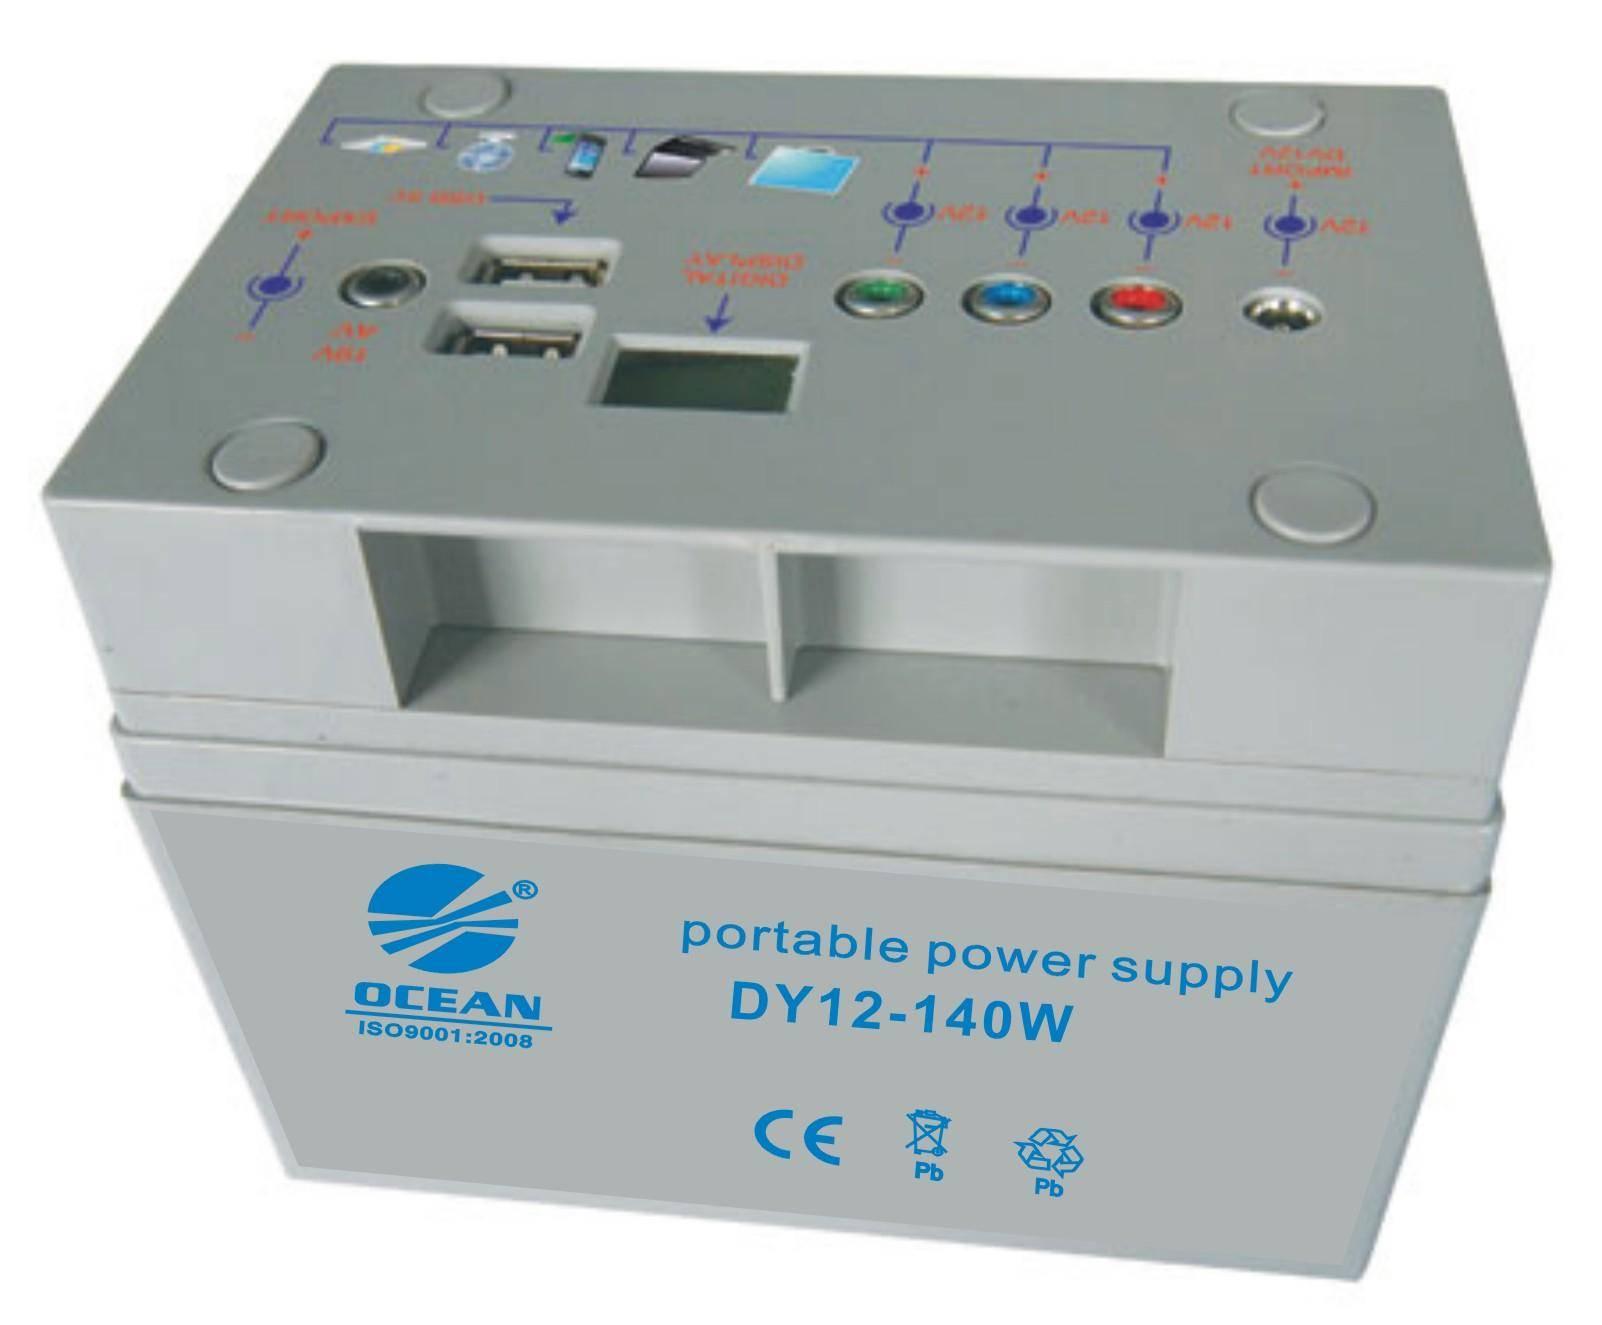 Portable solar power bank - DC 12V/140W